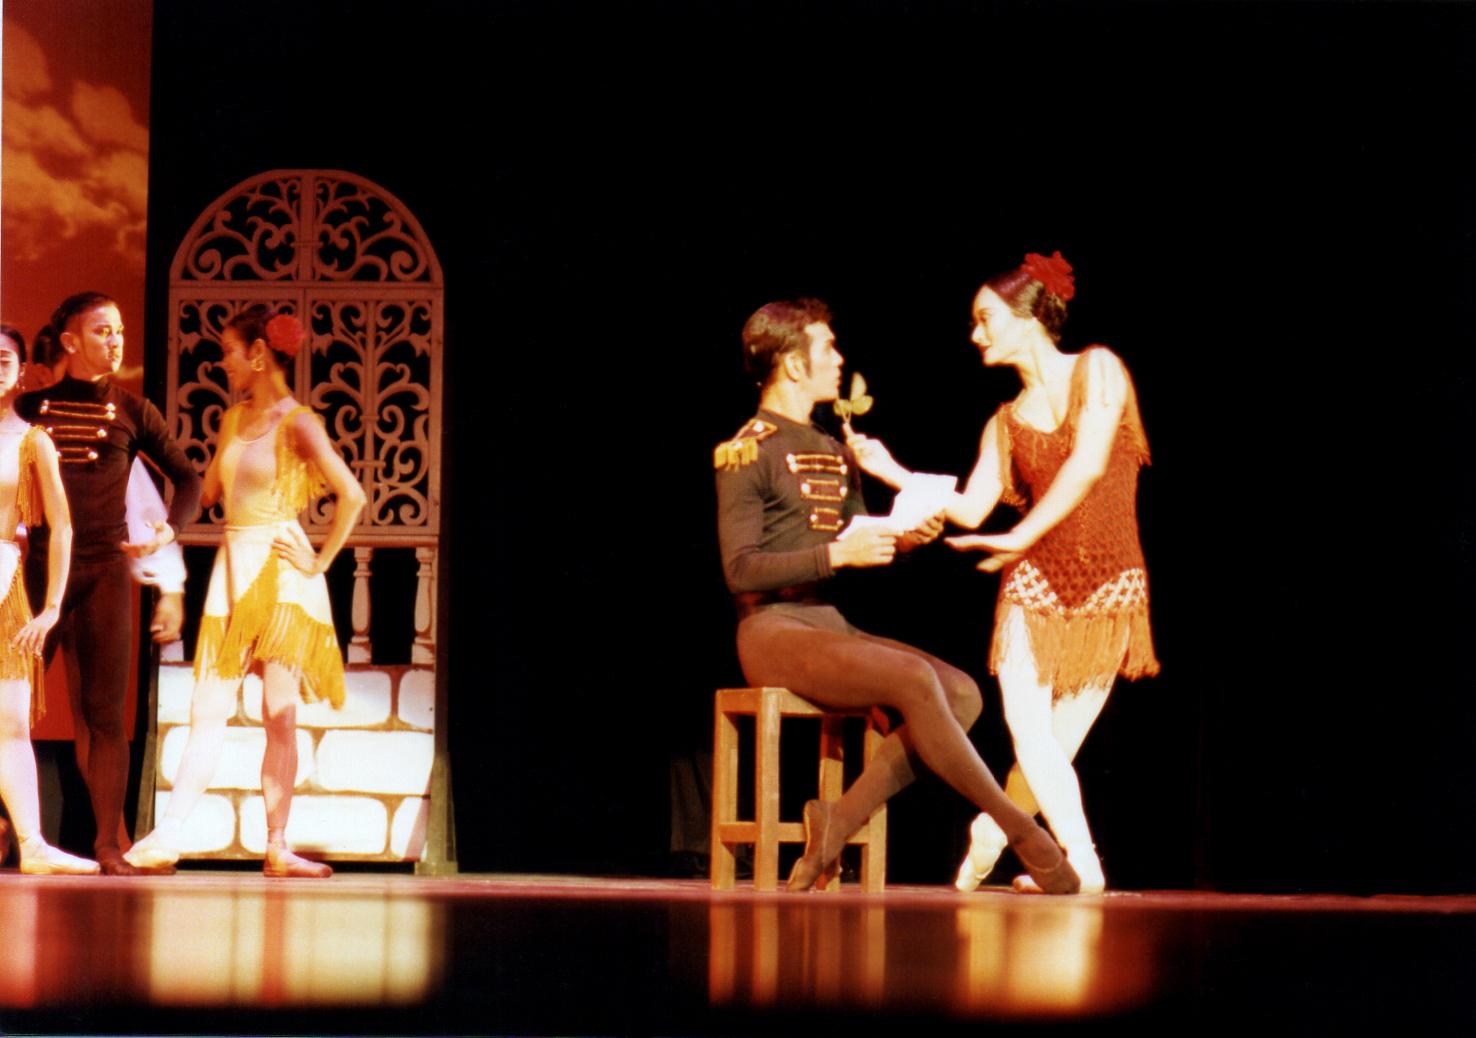 Lisa Macuja-Elizalde in the title role of Carmen seduces Don Jose (Osias Barroso). Photo by Ocs Alvarez